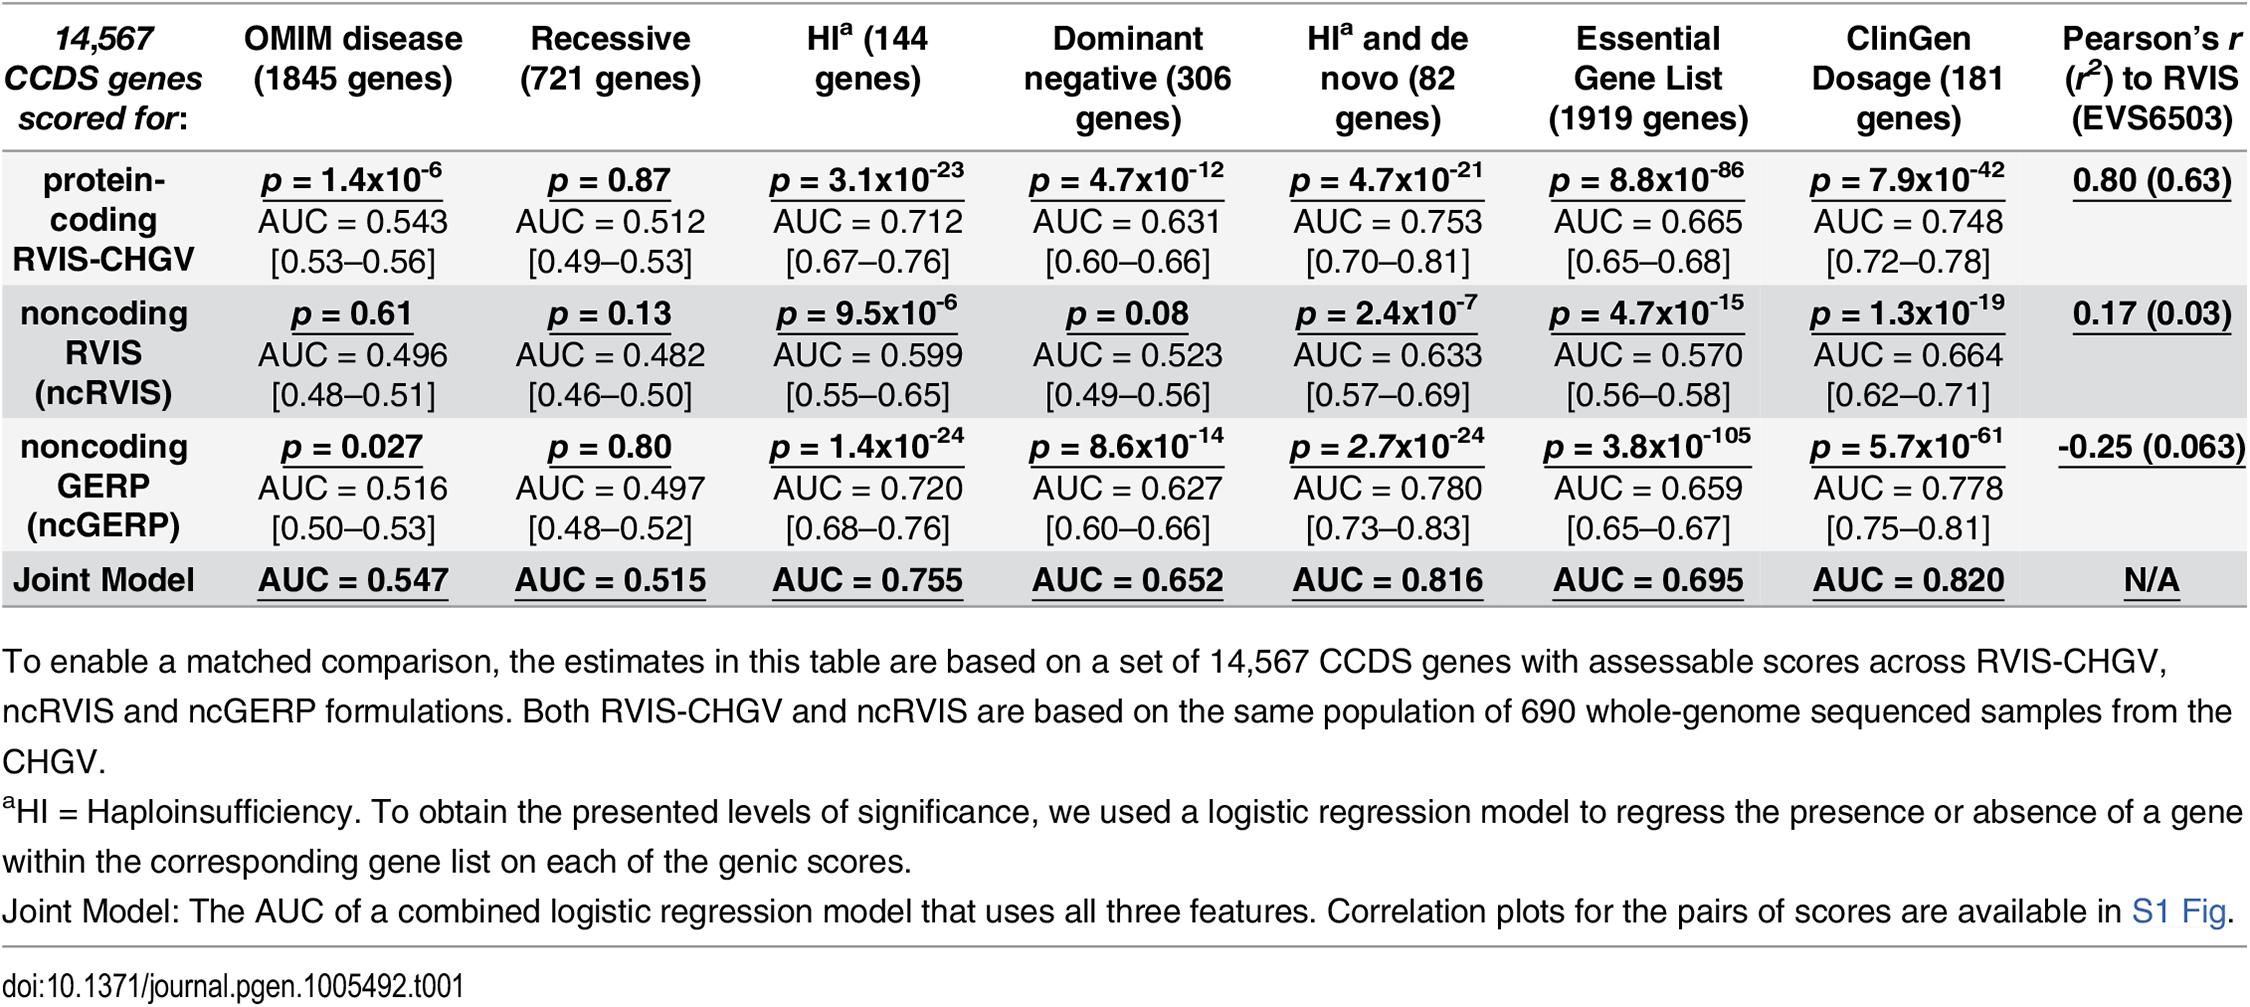 Comparing protein-coding and noncoding genic intolerance scores.